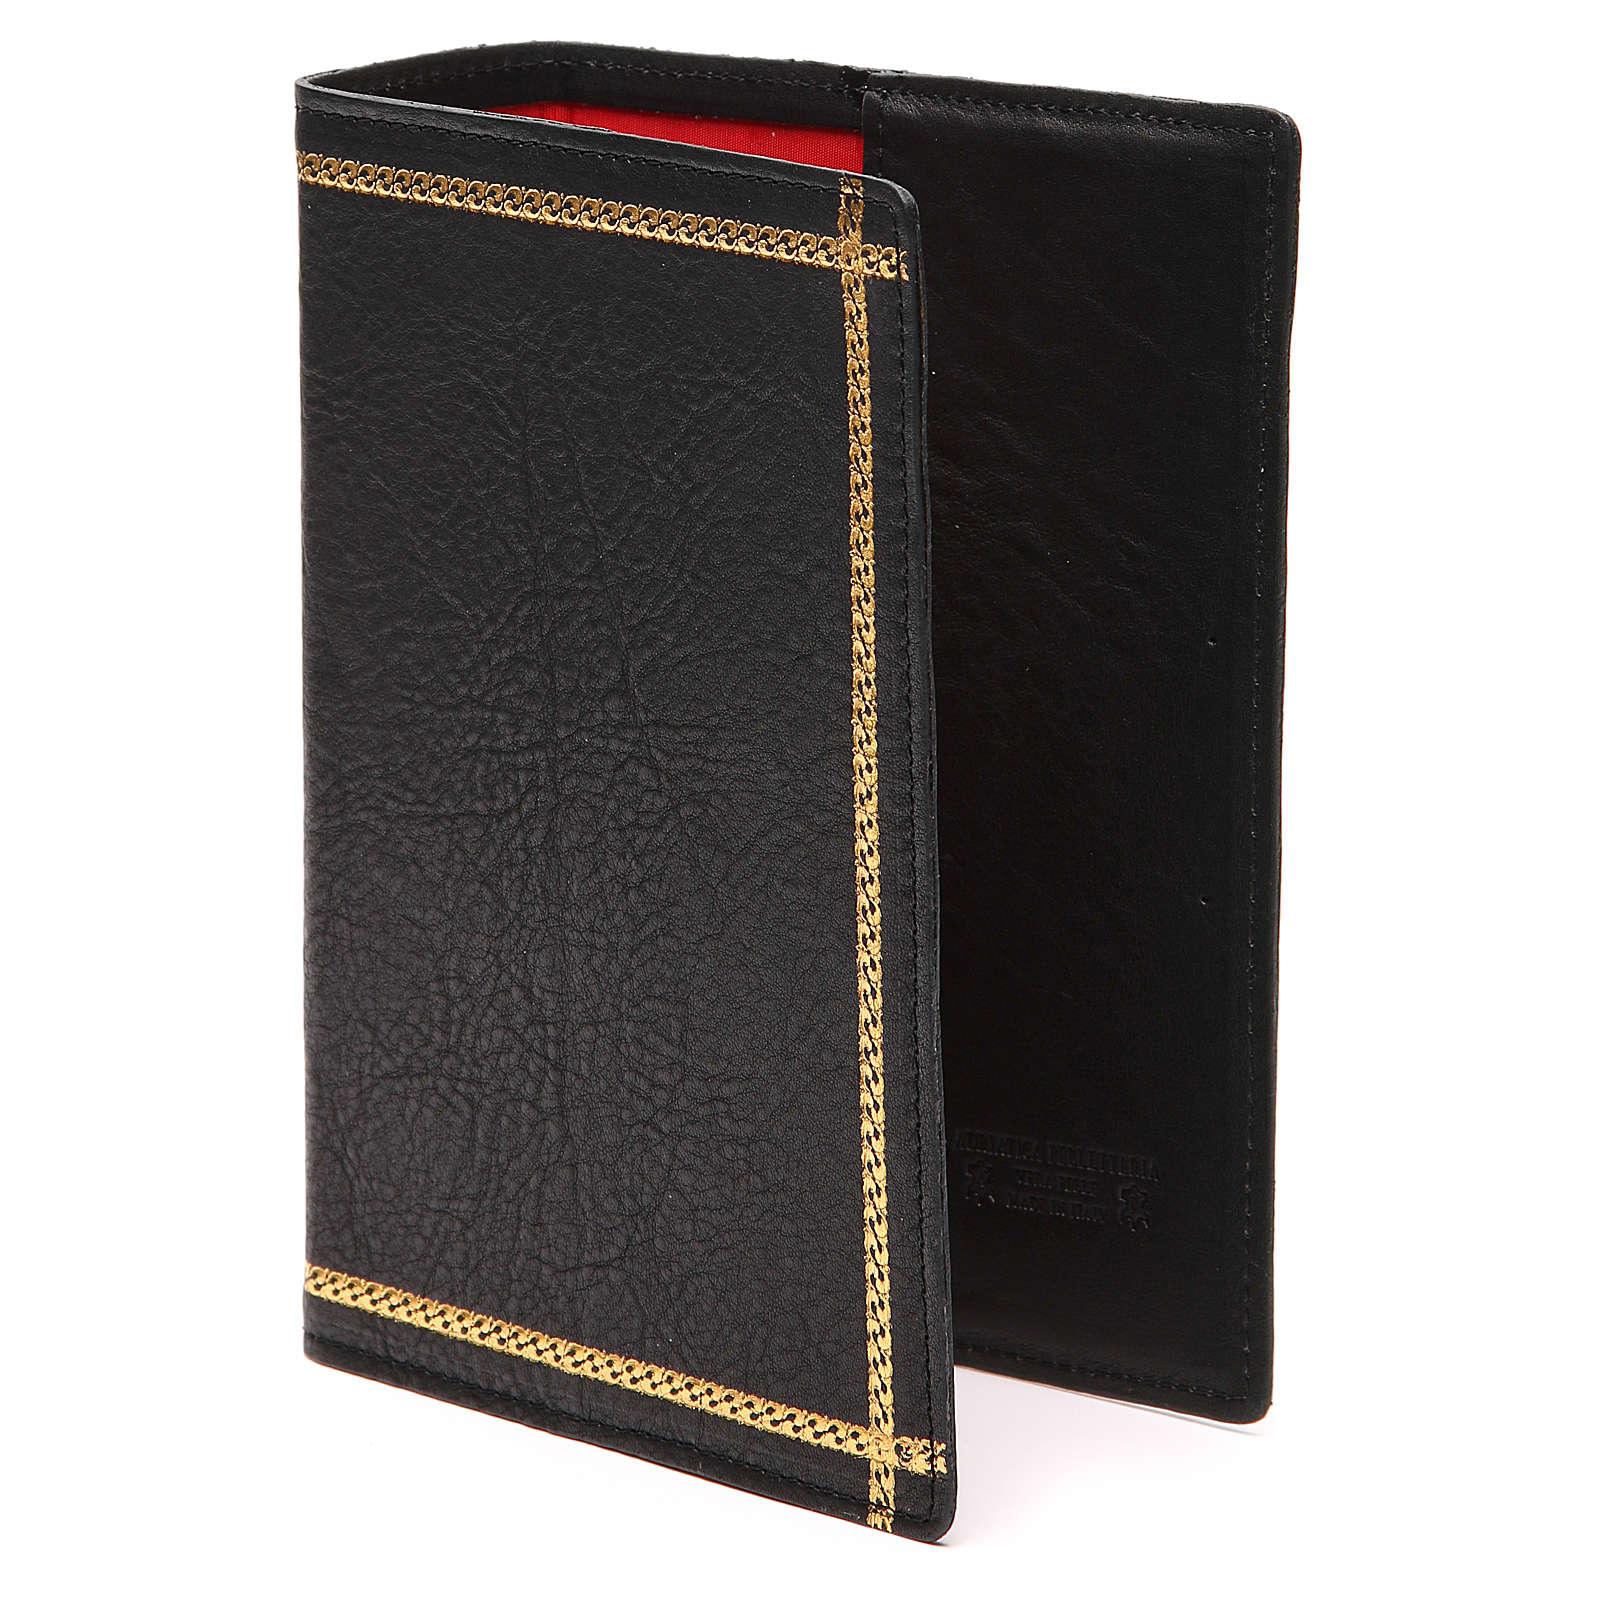 Custodia Bibbia Gerusalemme scritta oro pelle nera 4